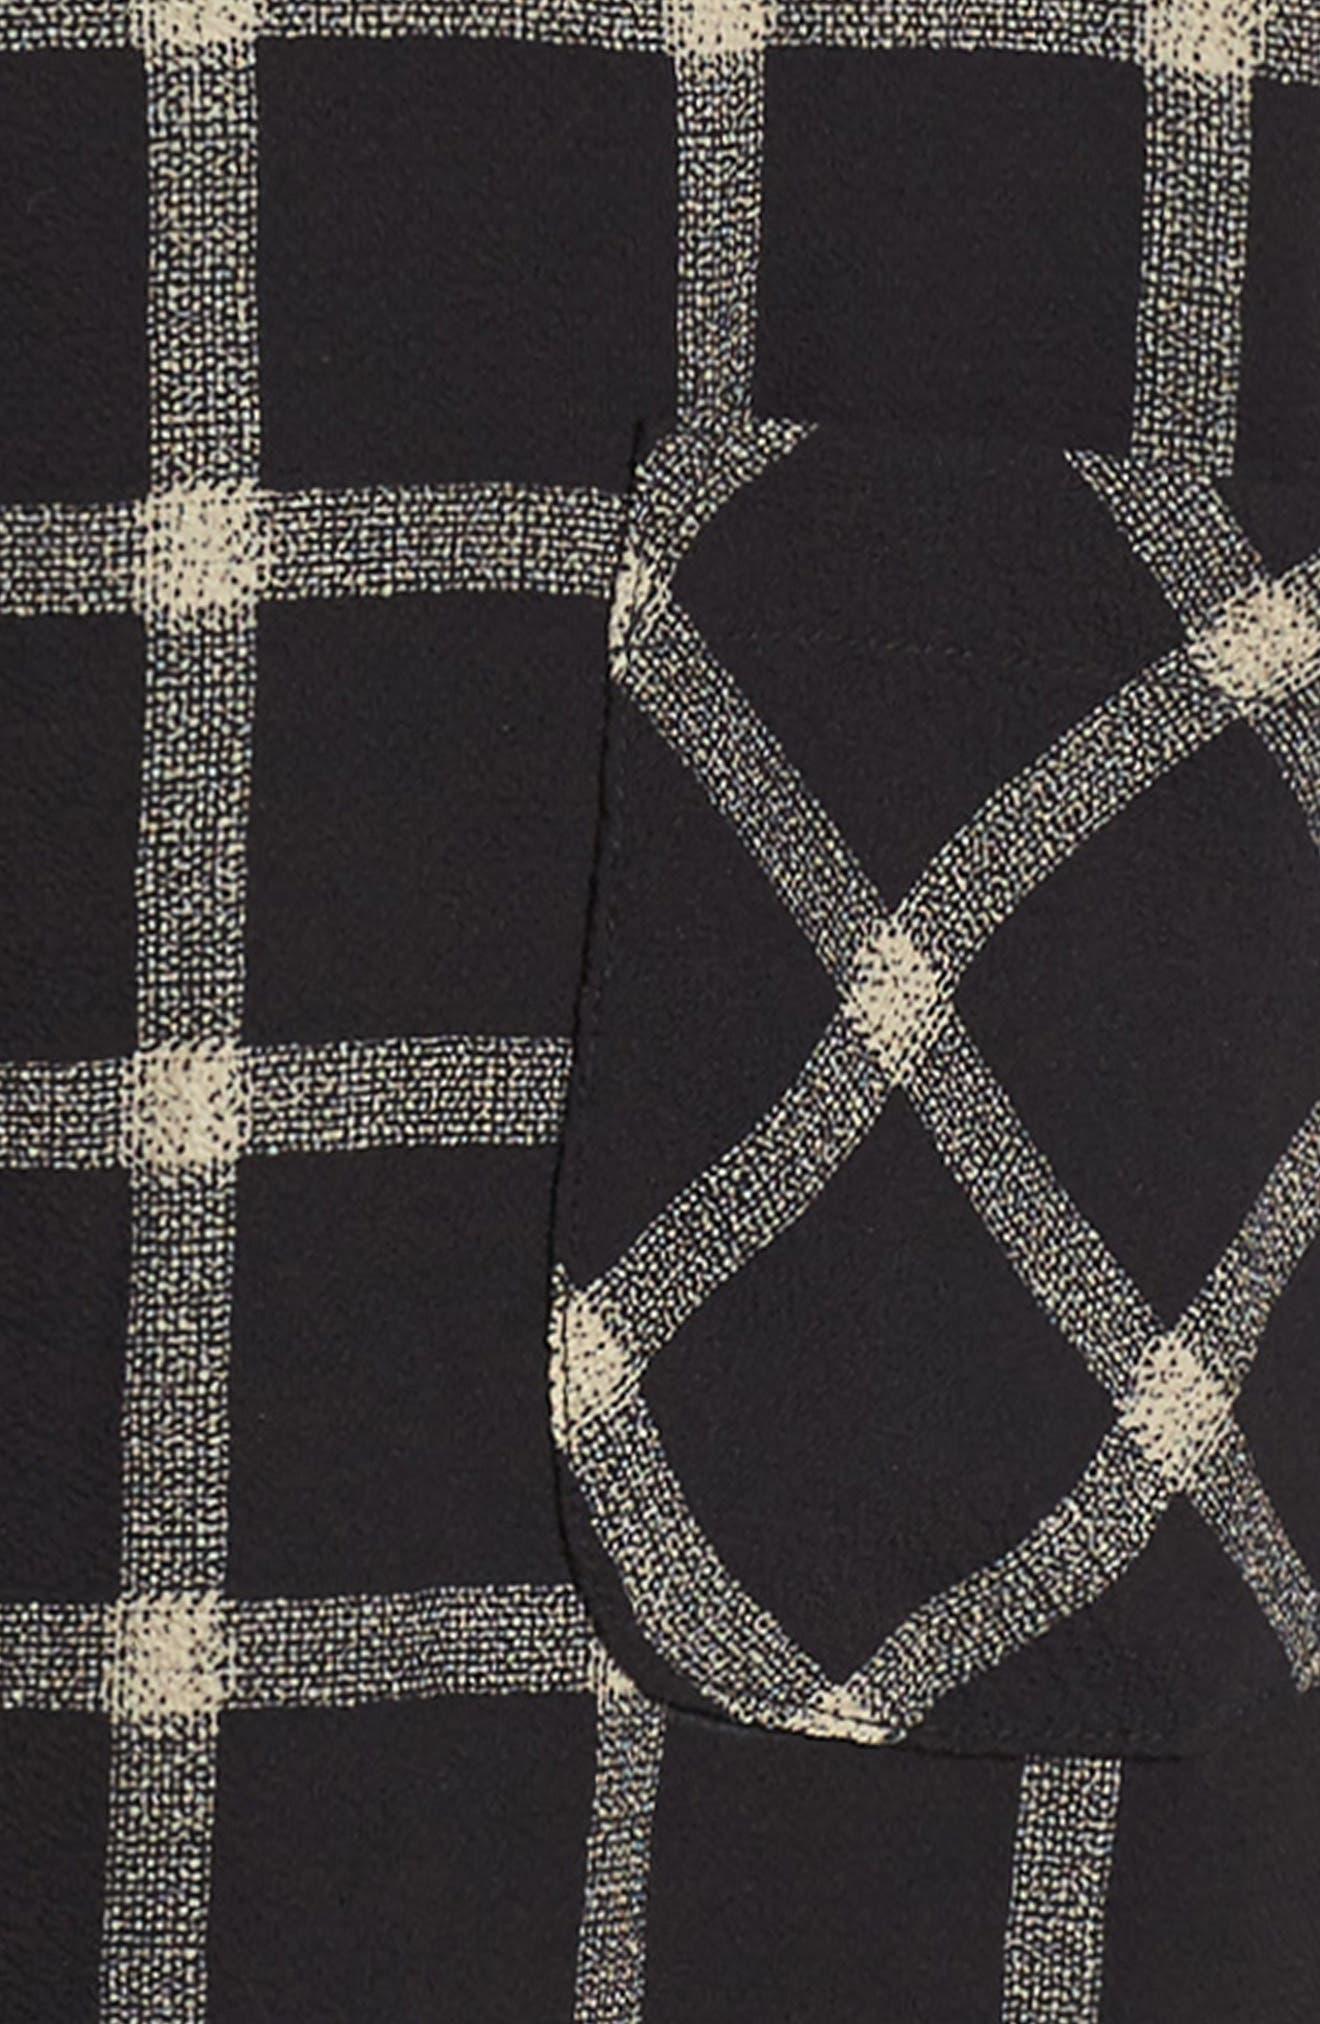 Plaid Top & Jumper Dress Set,                             Alternate thumbnail 3, color,                             006